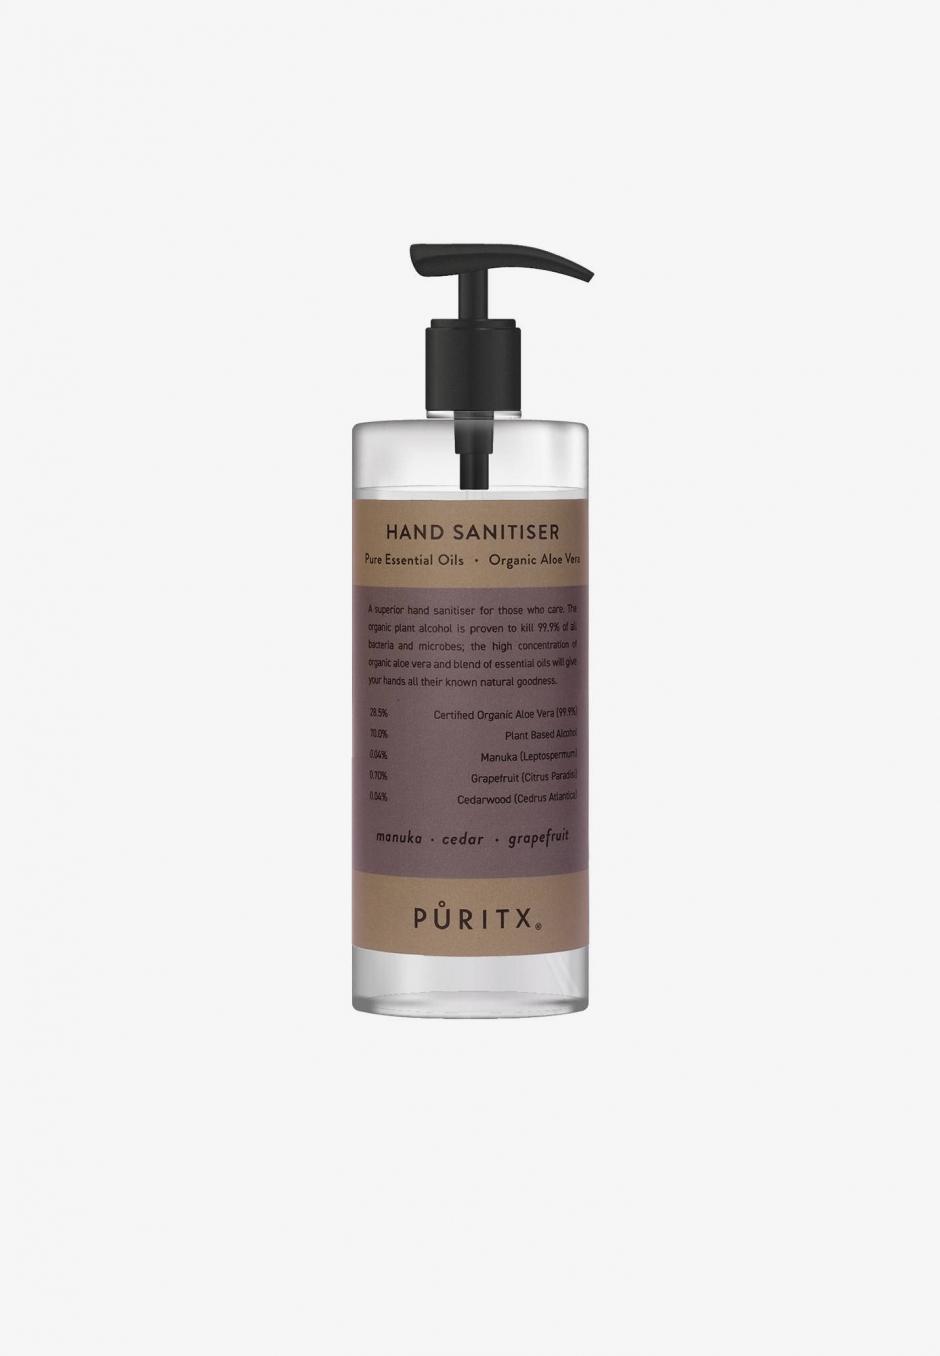 Puritx Hand Sanitiser 250 ml - Manuka/Cedar/Grapefruit